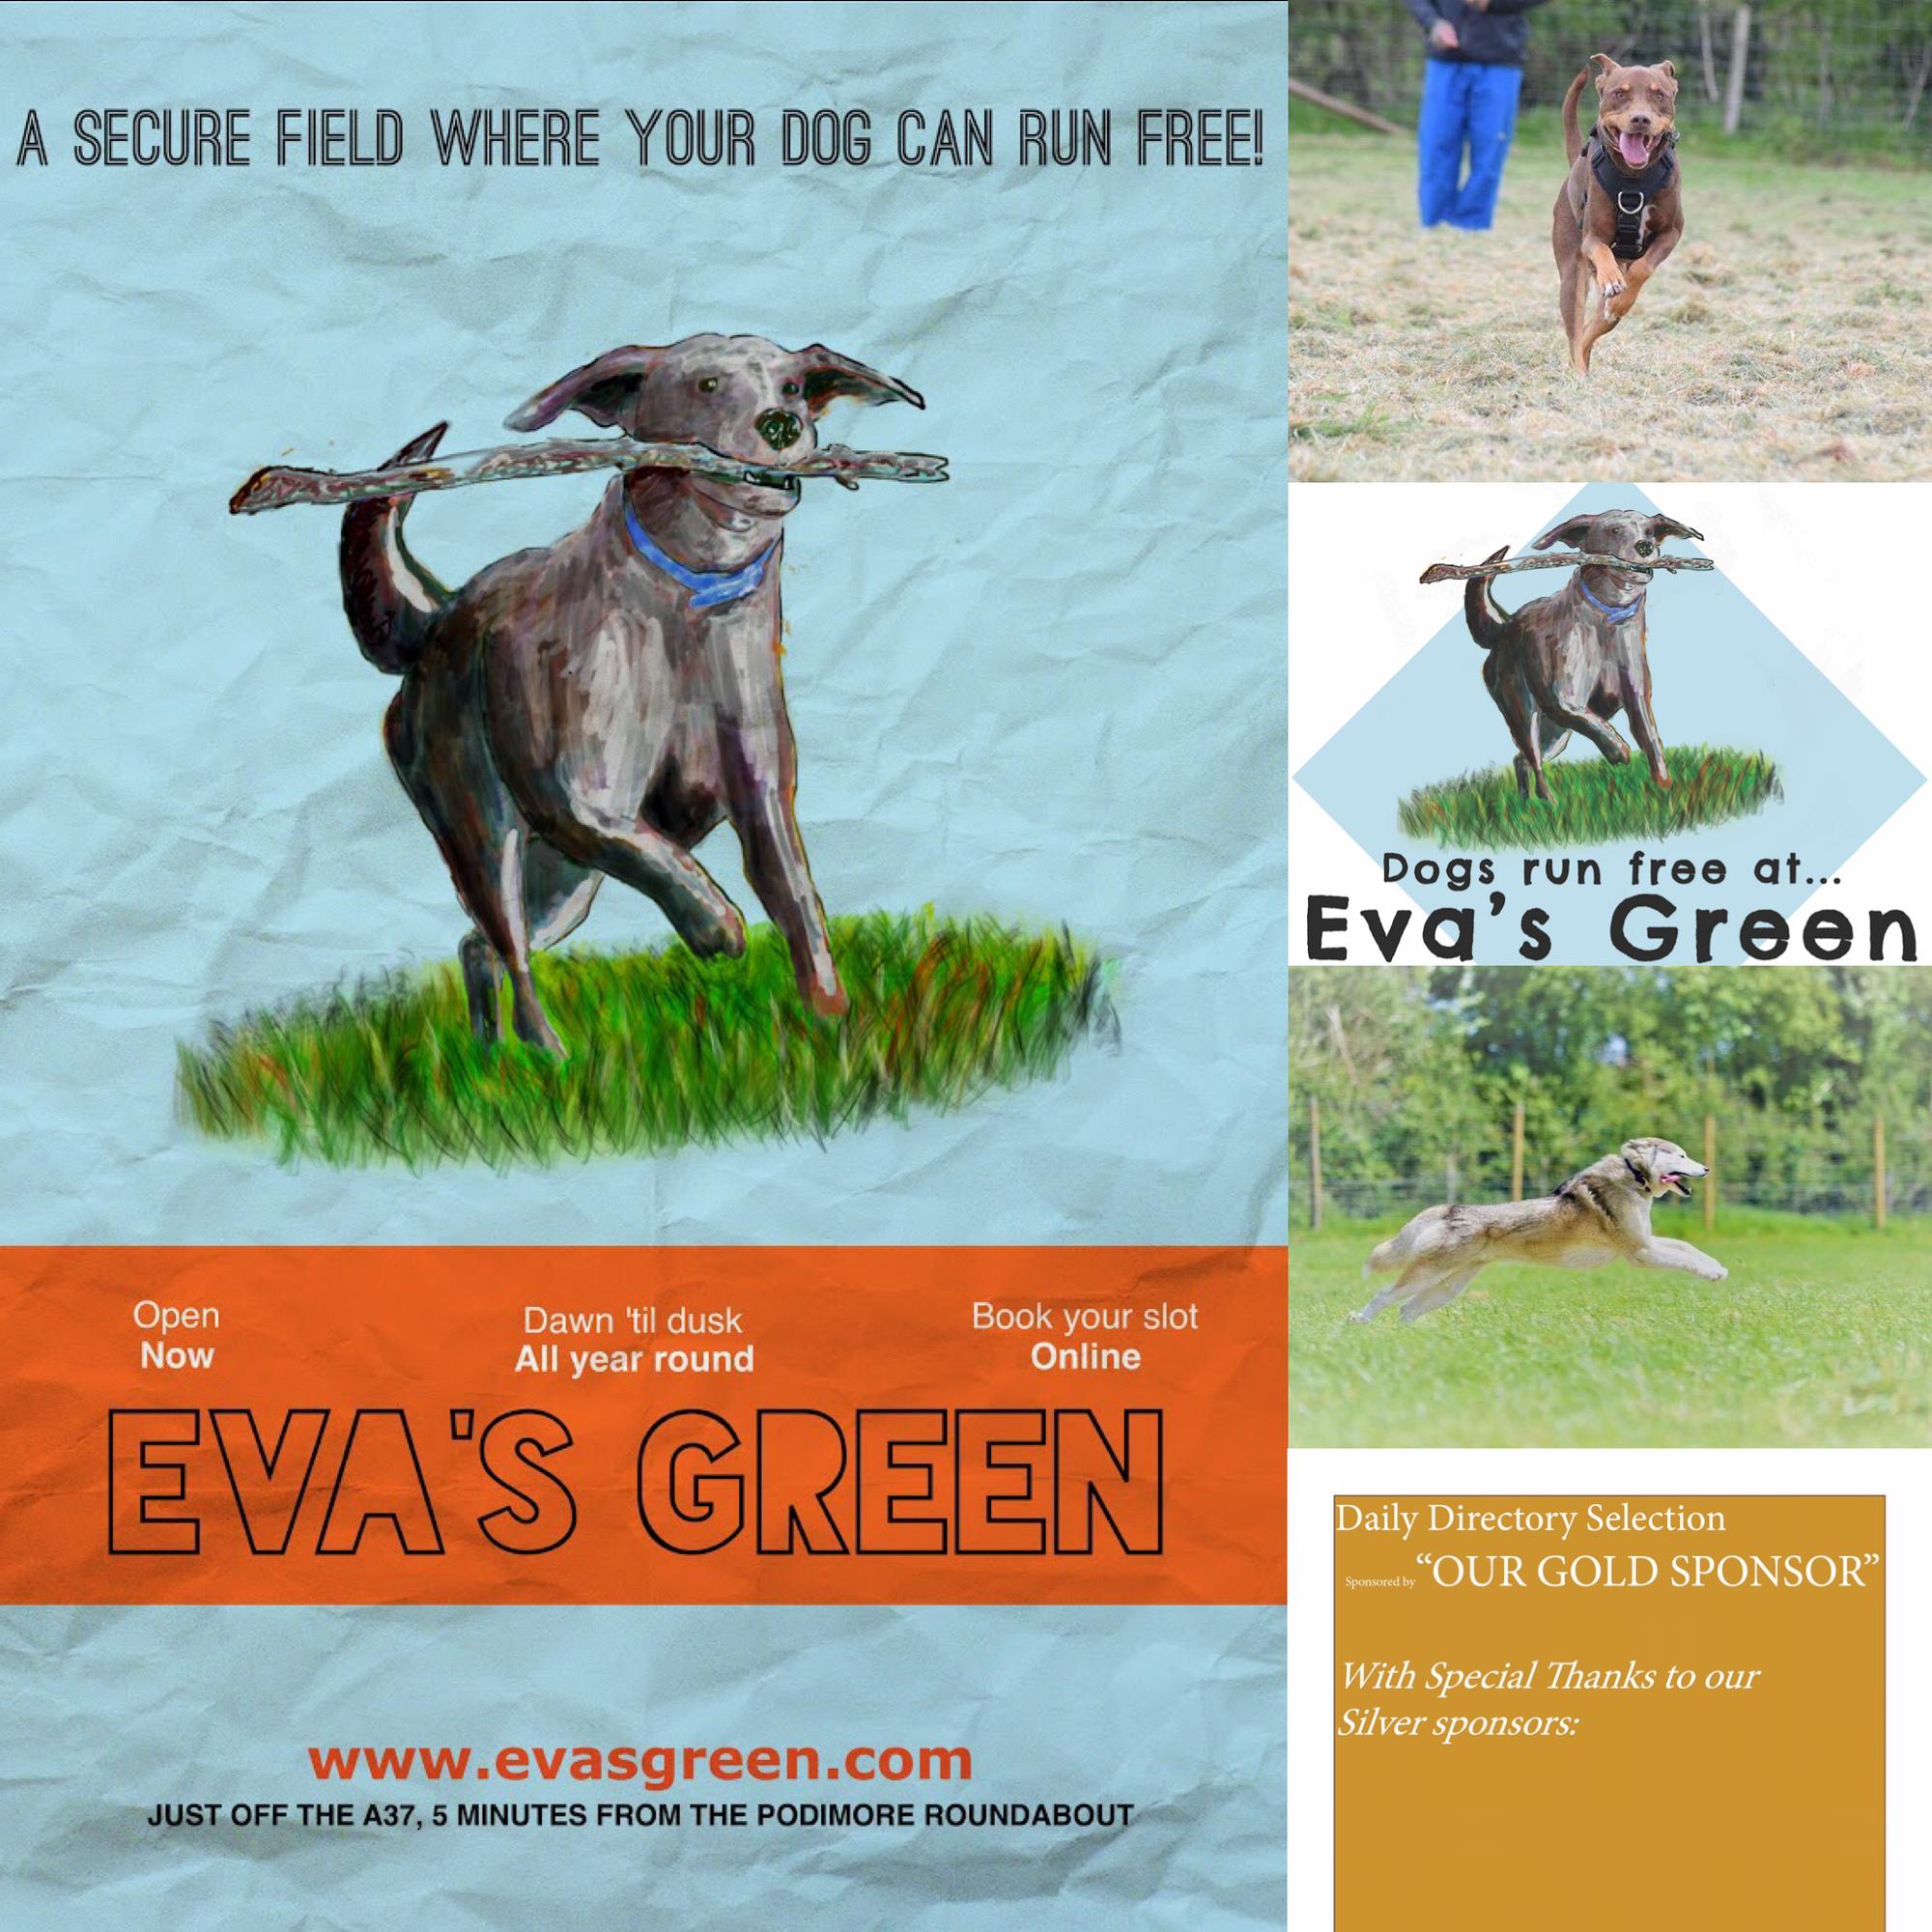 Eva S Green Enclosed Dog Field Eva S Green Steart Lane Somerton Somerset Ta11 7bd Book At Www Evasgreen Com Connect With U Dog Play Area Dog Walking Dogs